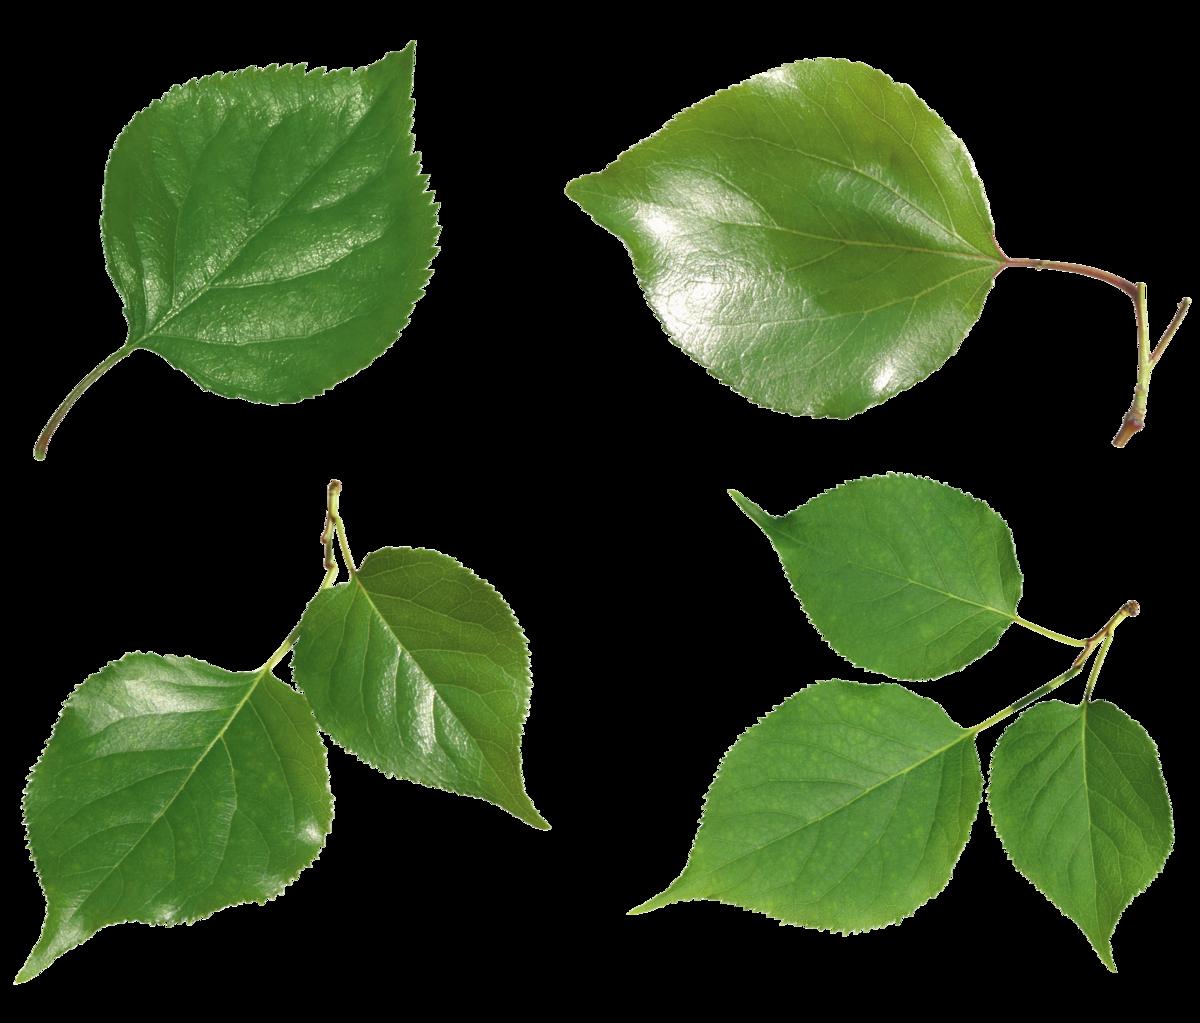 картинки листьев деревьев для презентации файлов